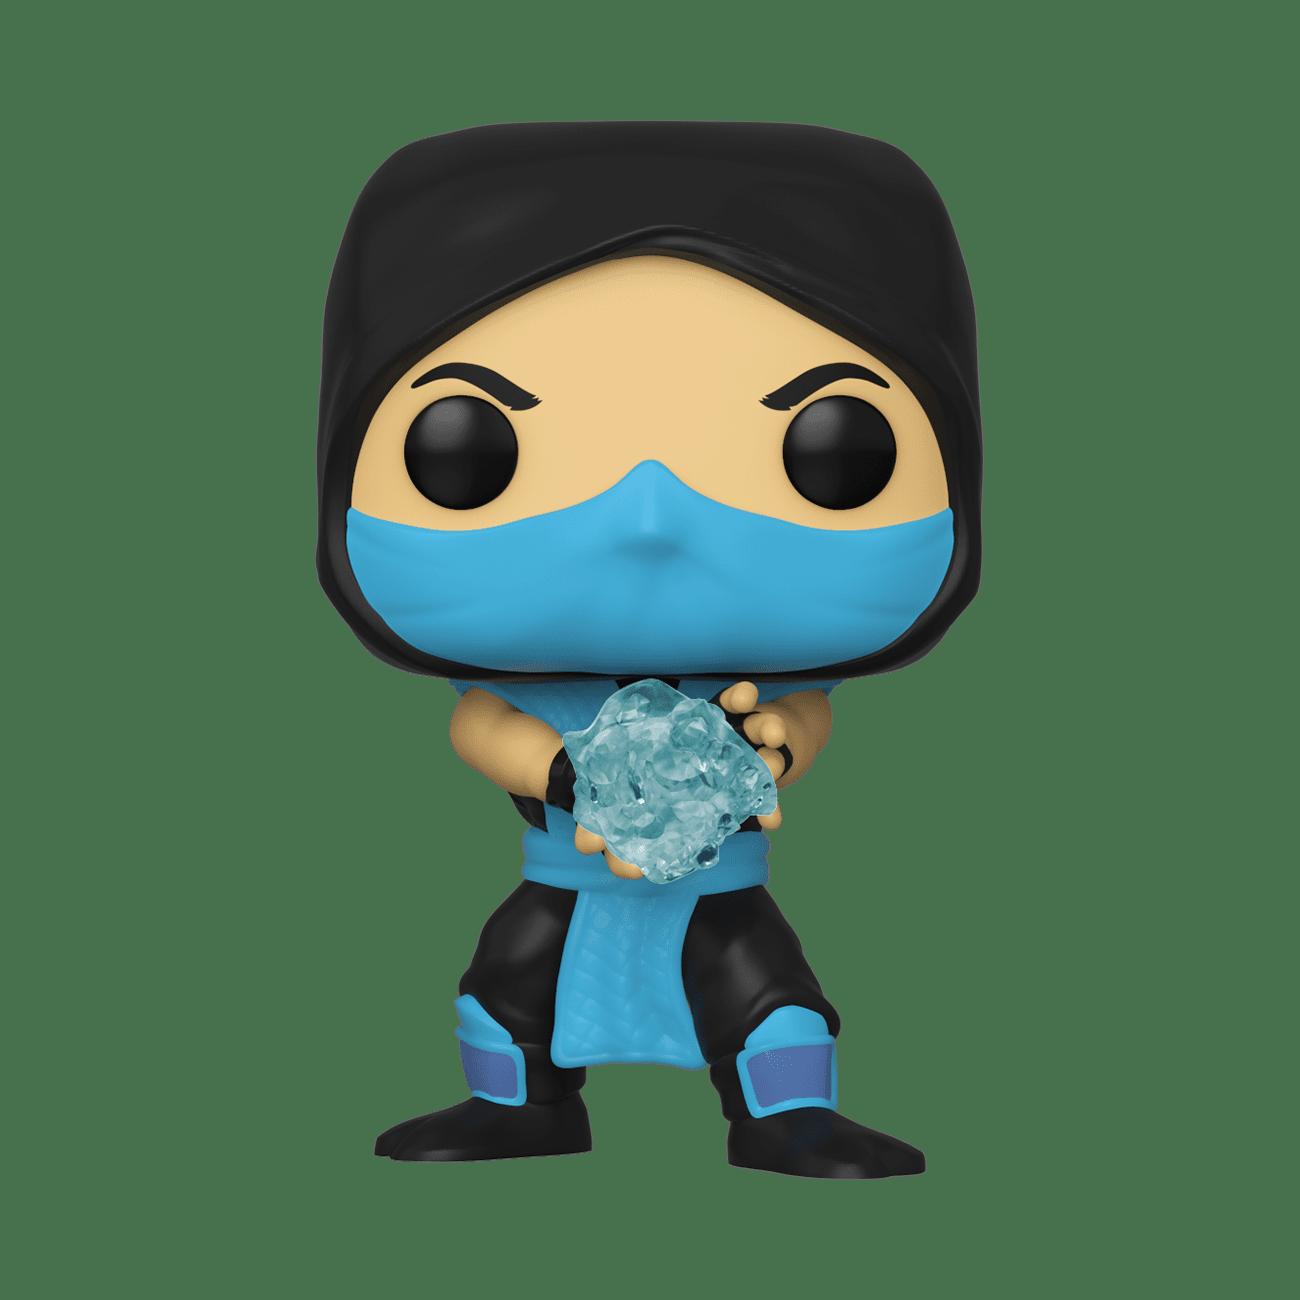 Mortal Kombat Sub-Zero Pop! Vinyl Figure